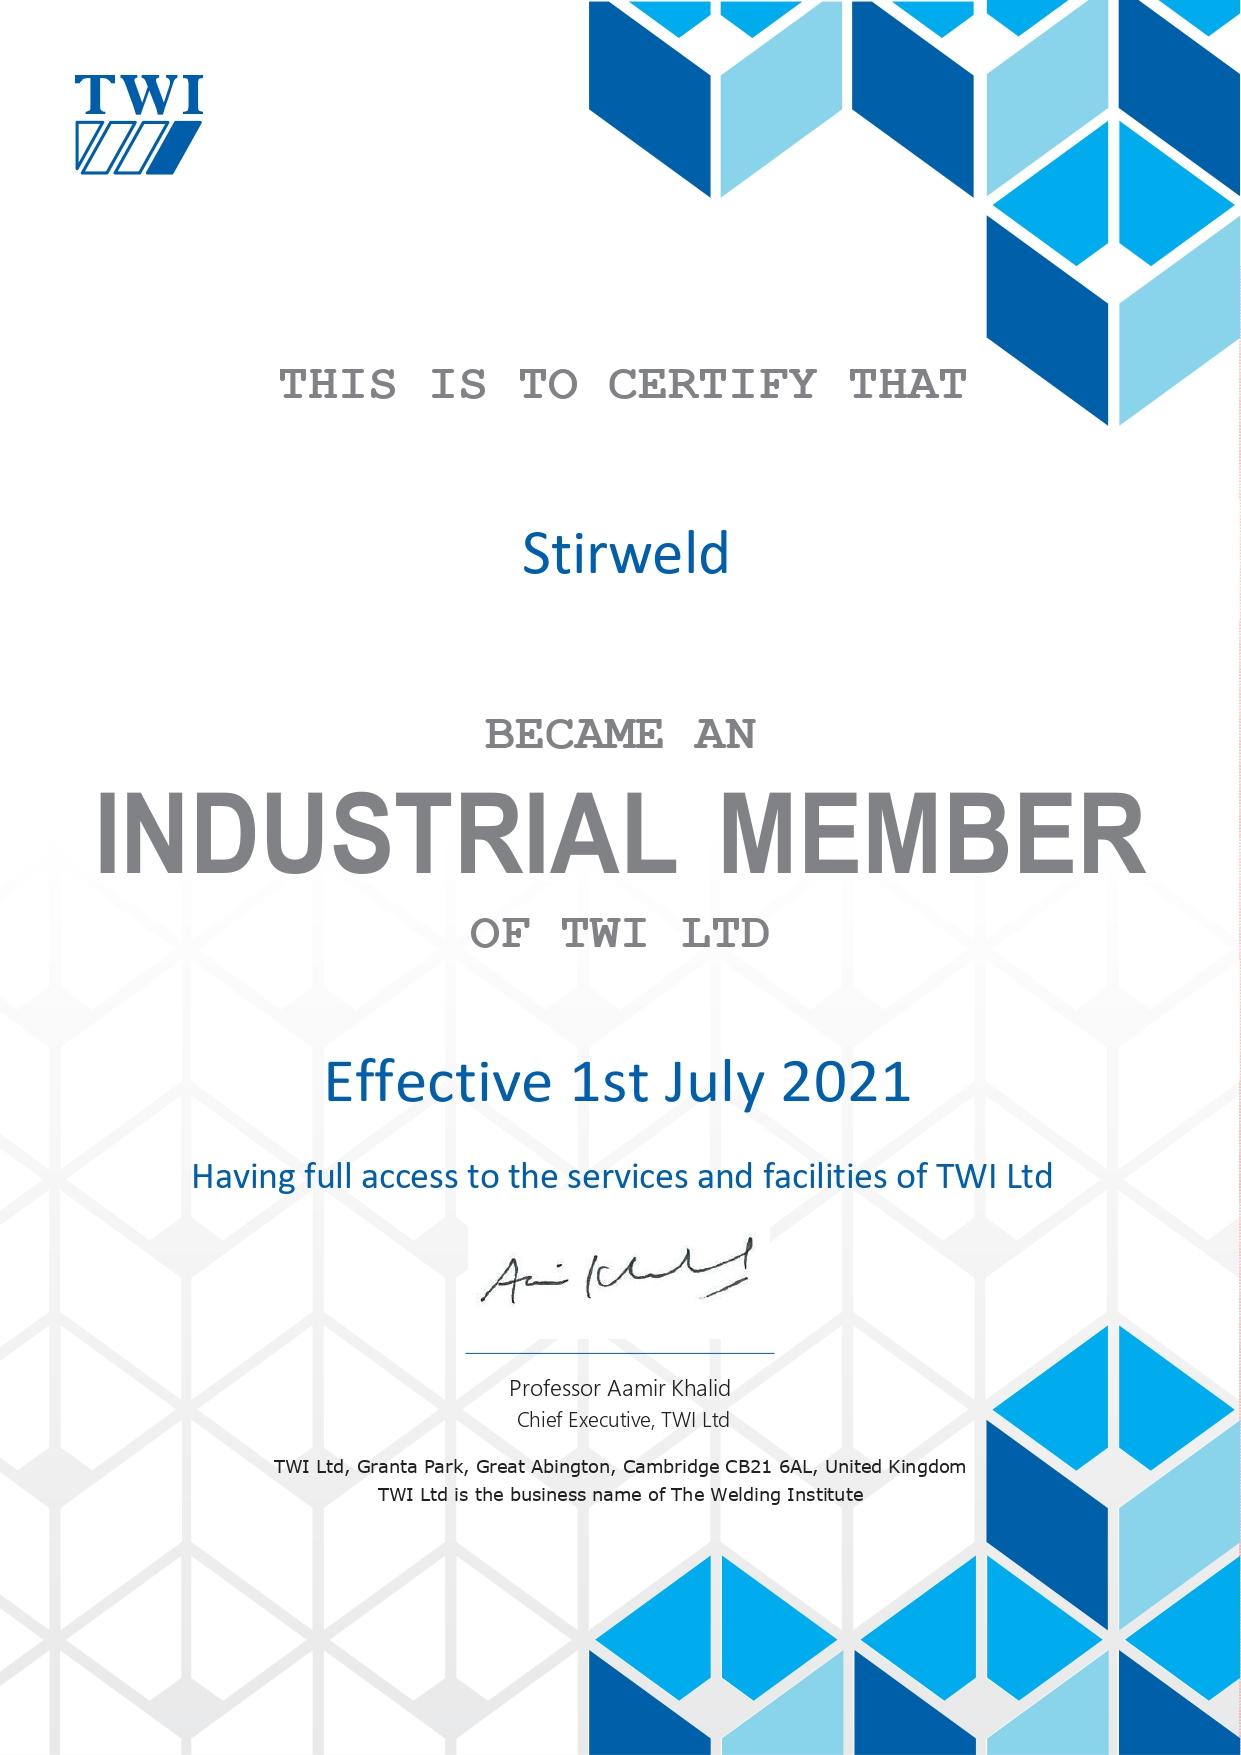 TWI industrial member: Stirweld